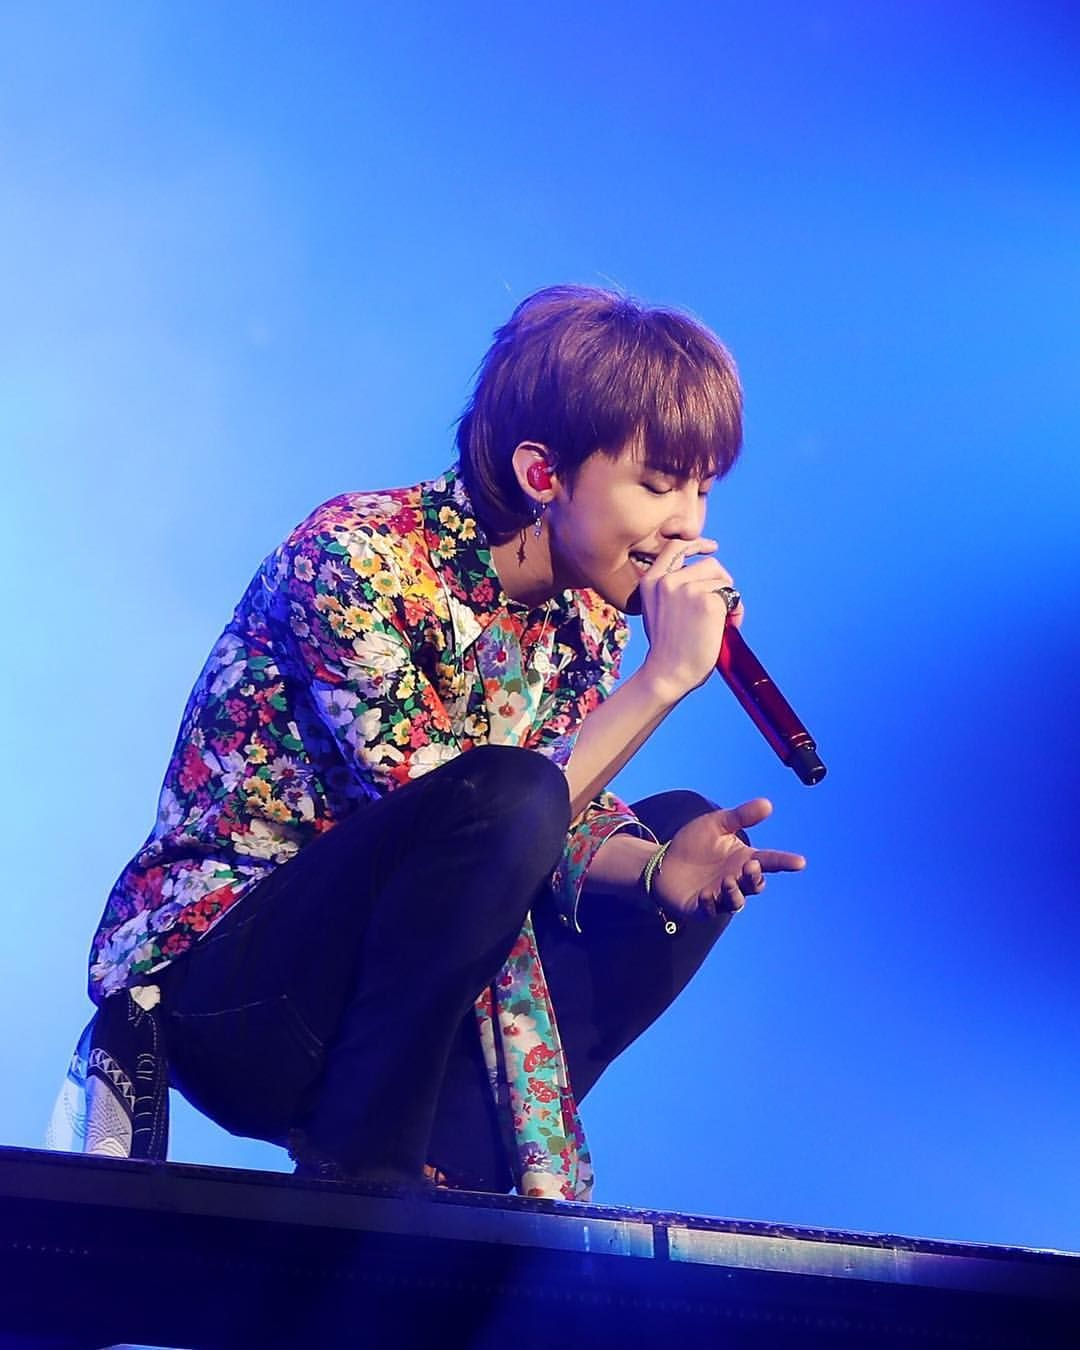 171118 BIGBANG Japan Dome Tour Last Dance in Fukuoka Day 1 #GDRAGON #GD#권지용#KwonJiYong…